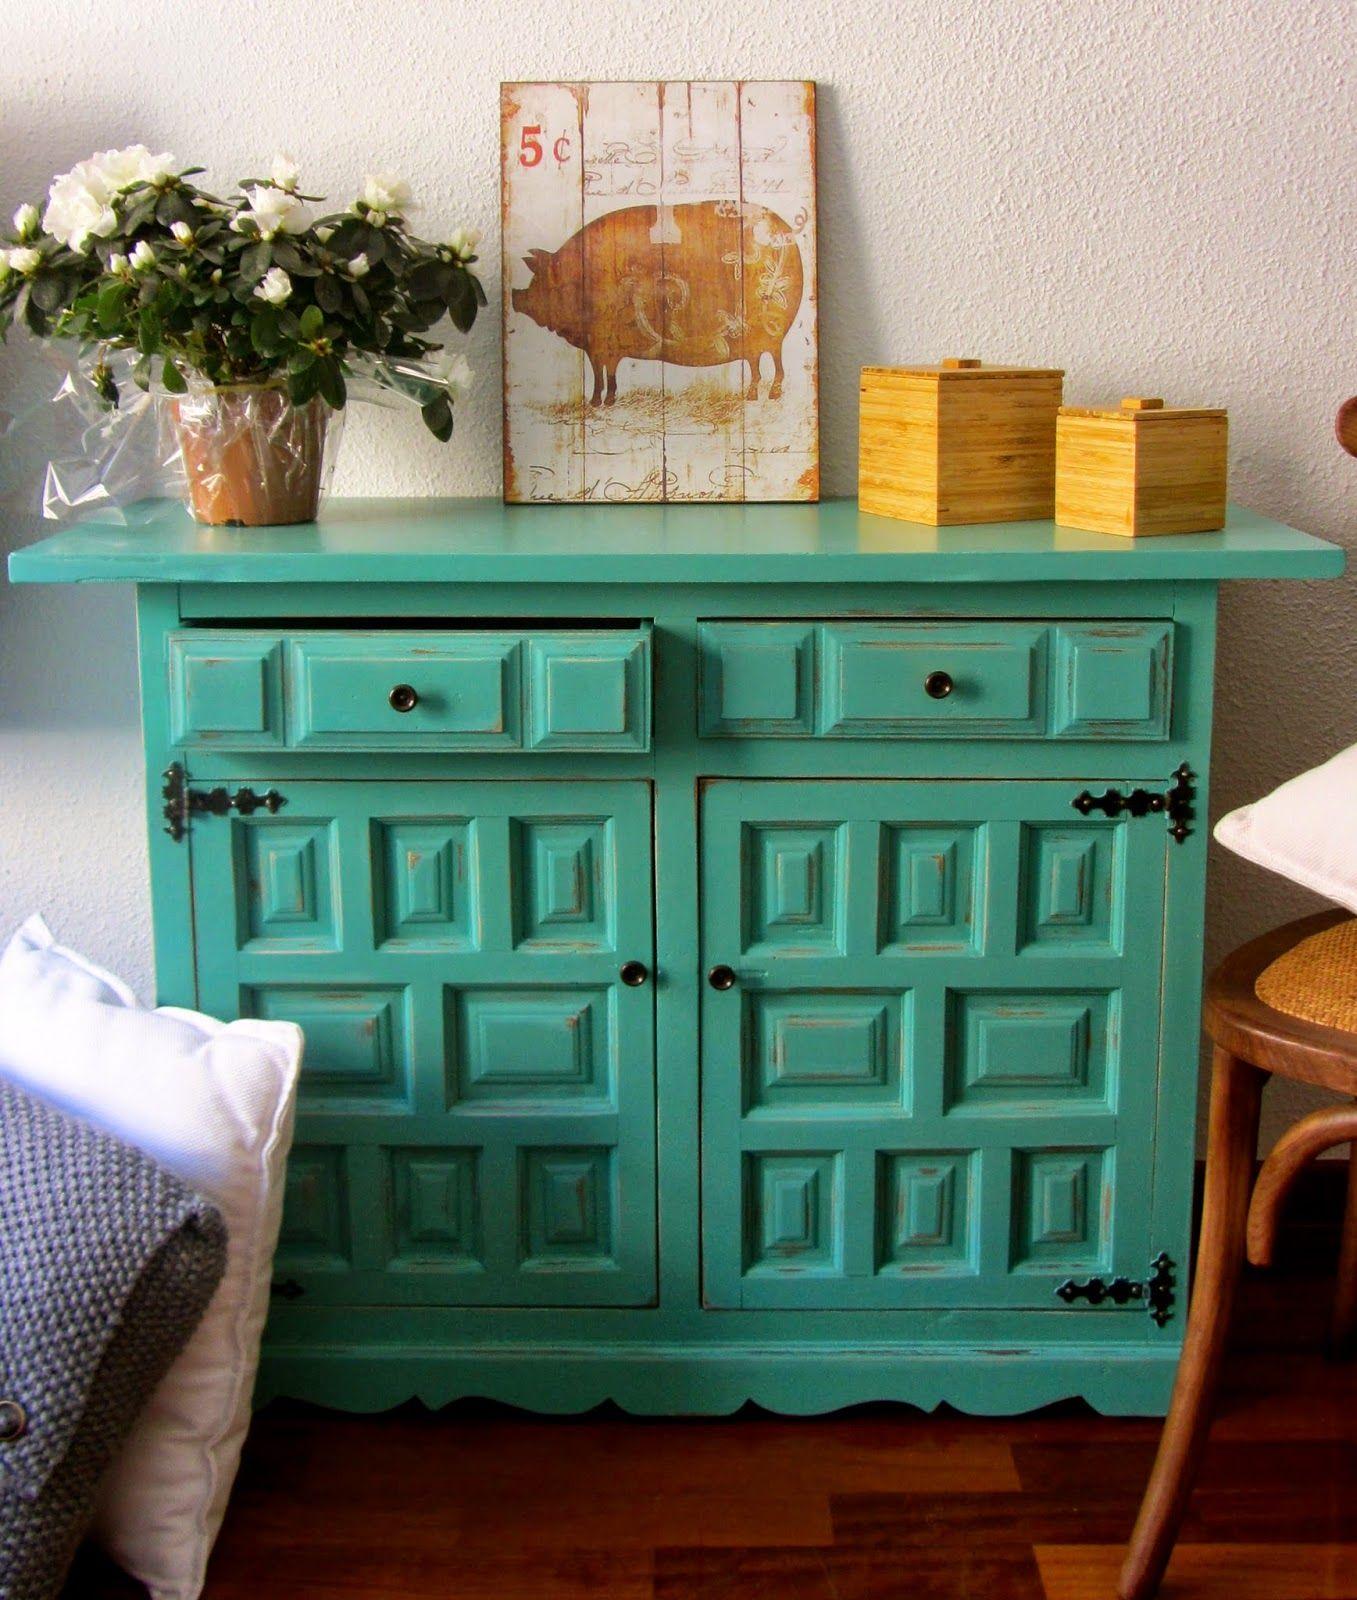 Wood Style C Moda Vintage Wood Style Pinterest C Modas  # Muebles Lijados Y Pintados